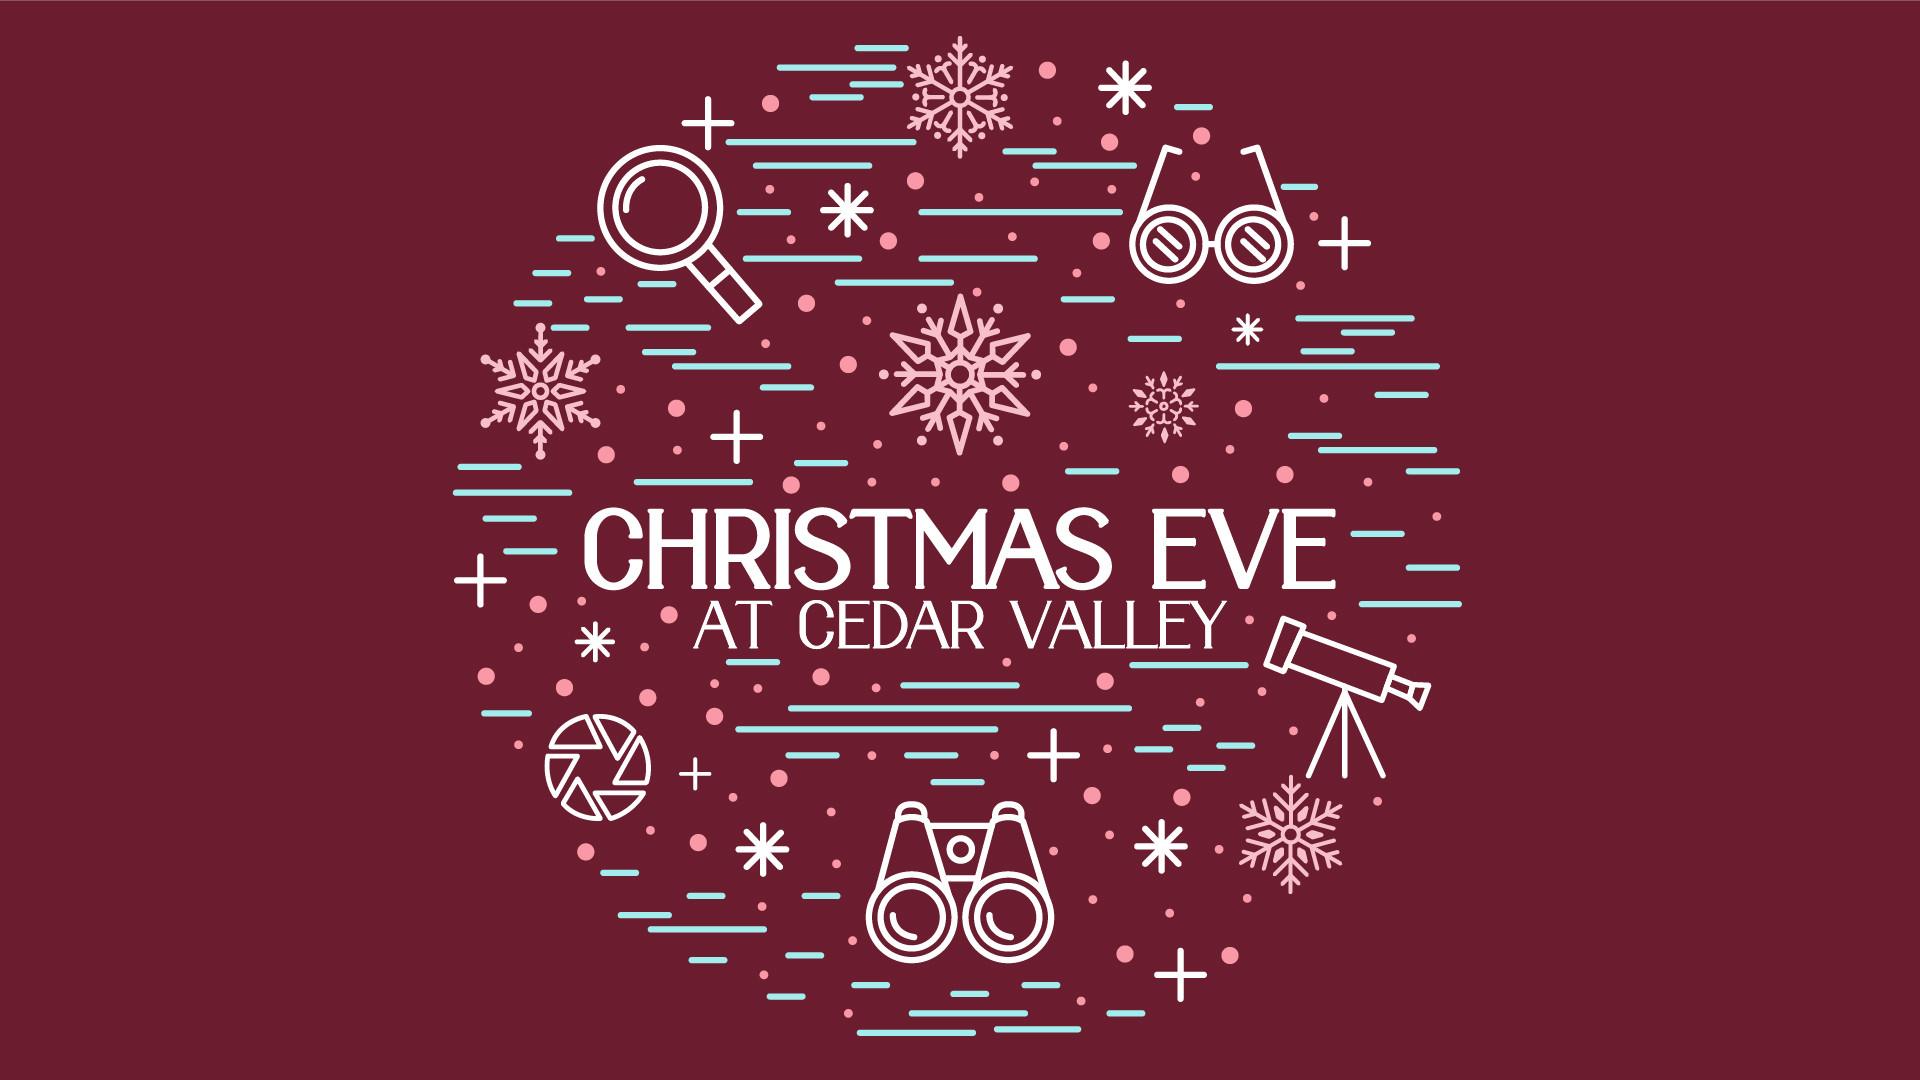 Christmas Eve at Cedar Valley